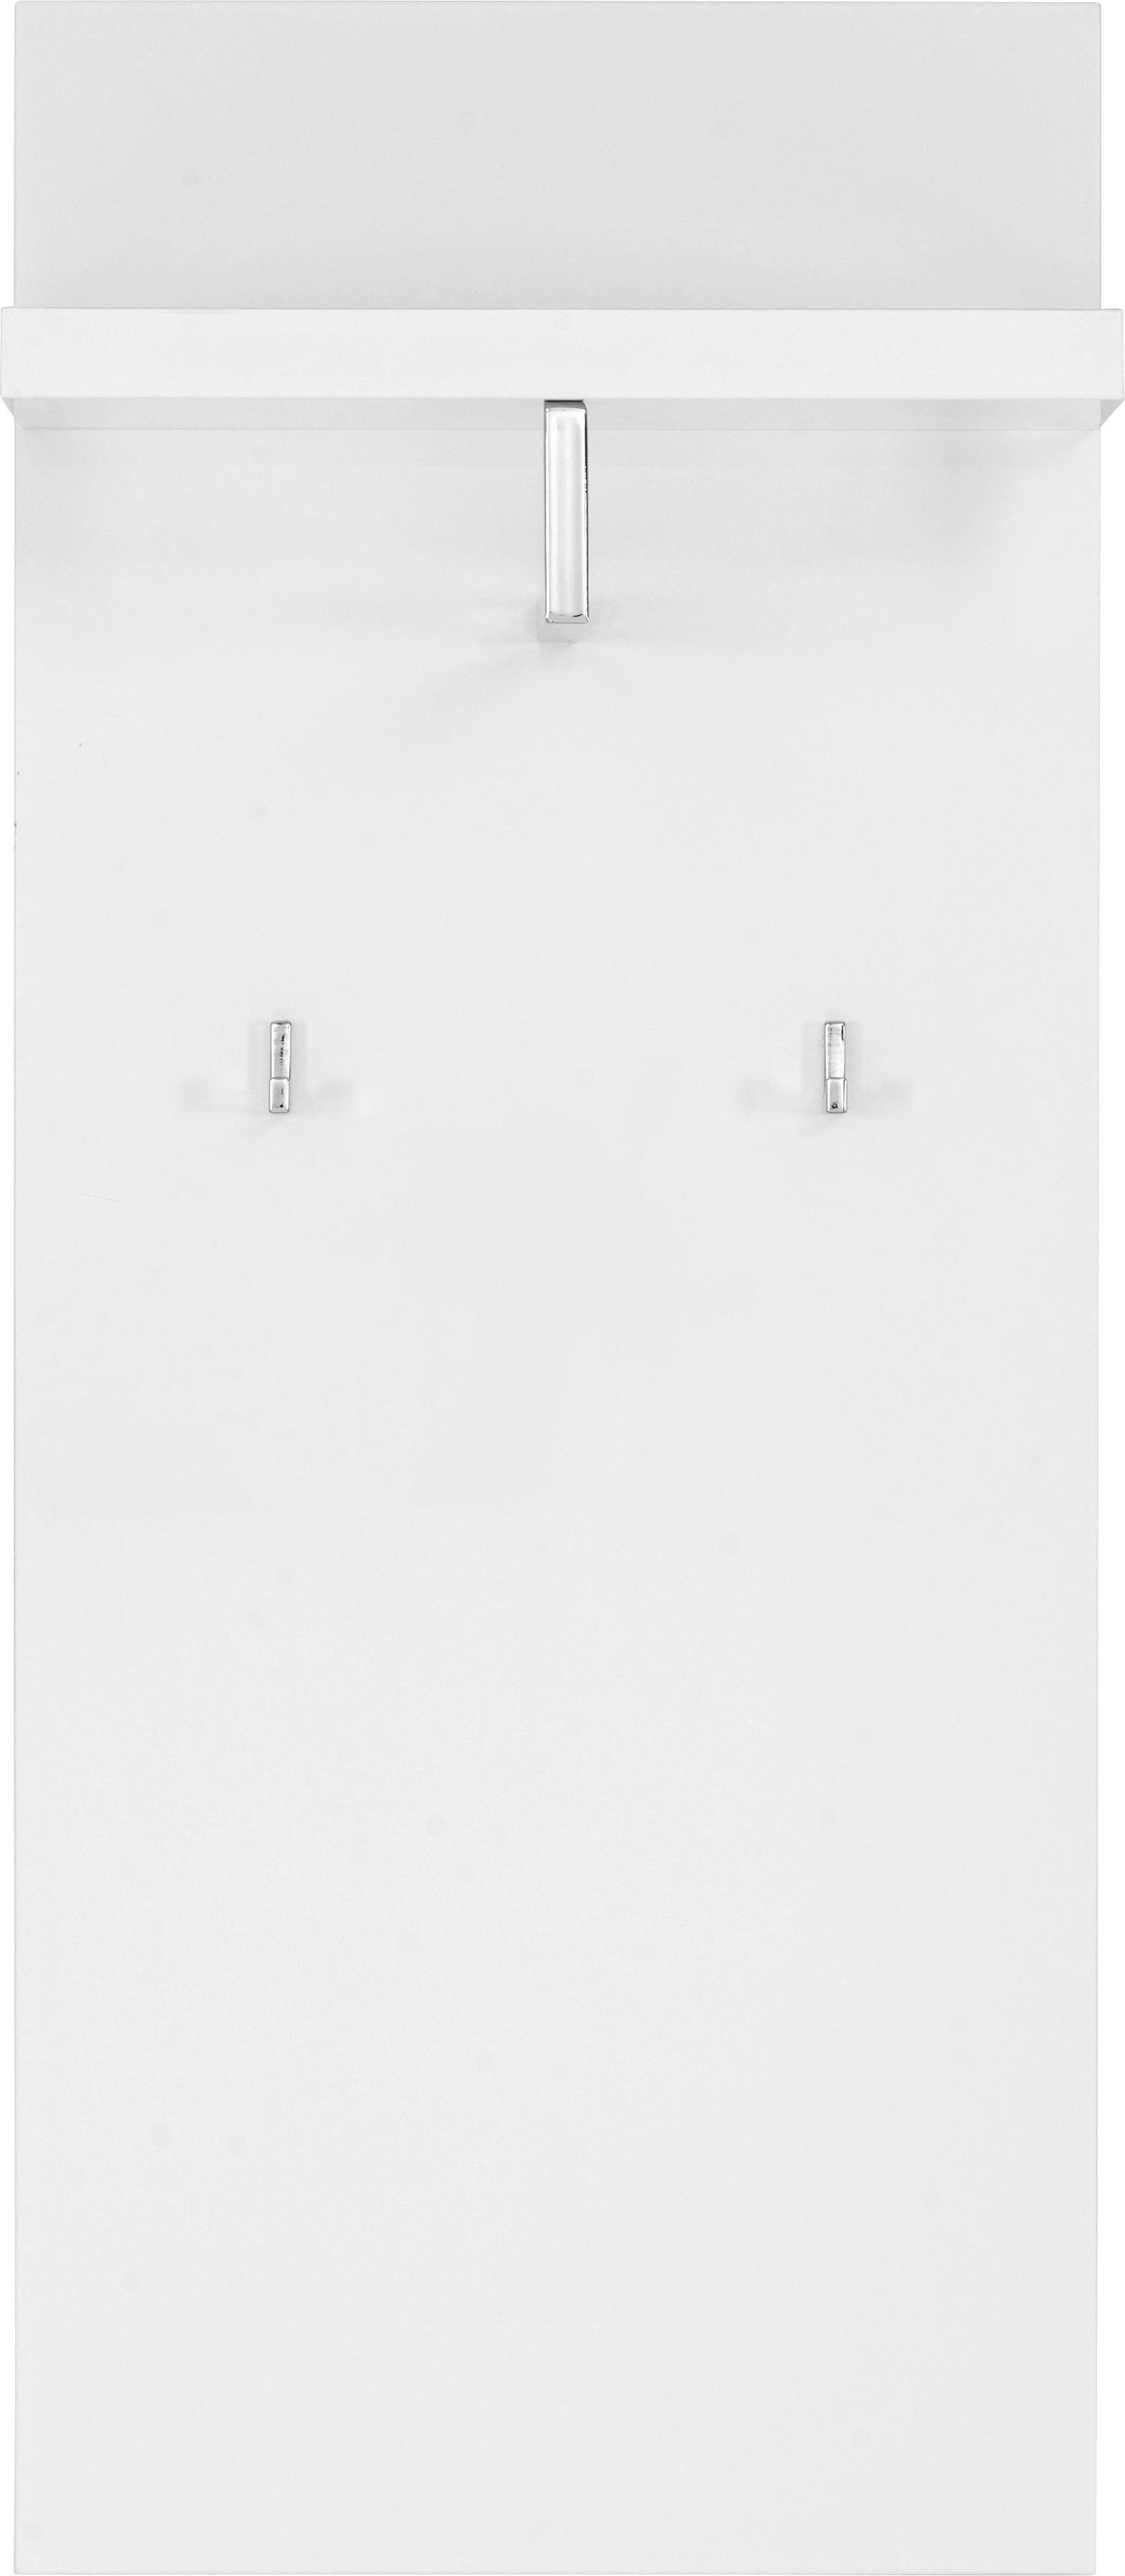 KLÄDHÄNGARE - vit, Modern, trä (51/121/25cm) - CARRYHOME